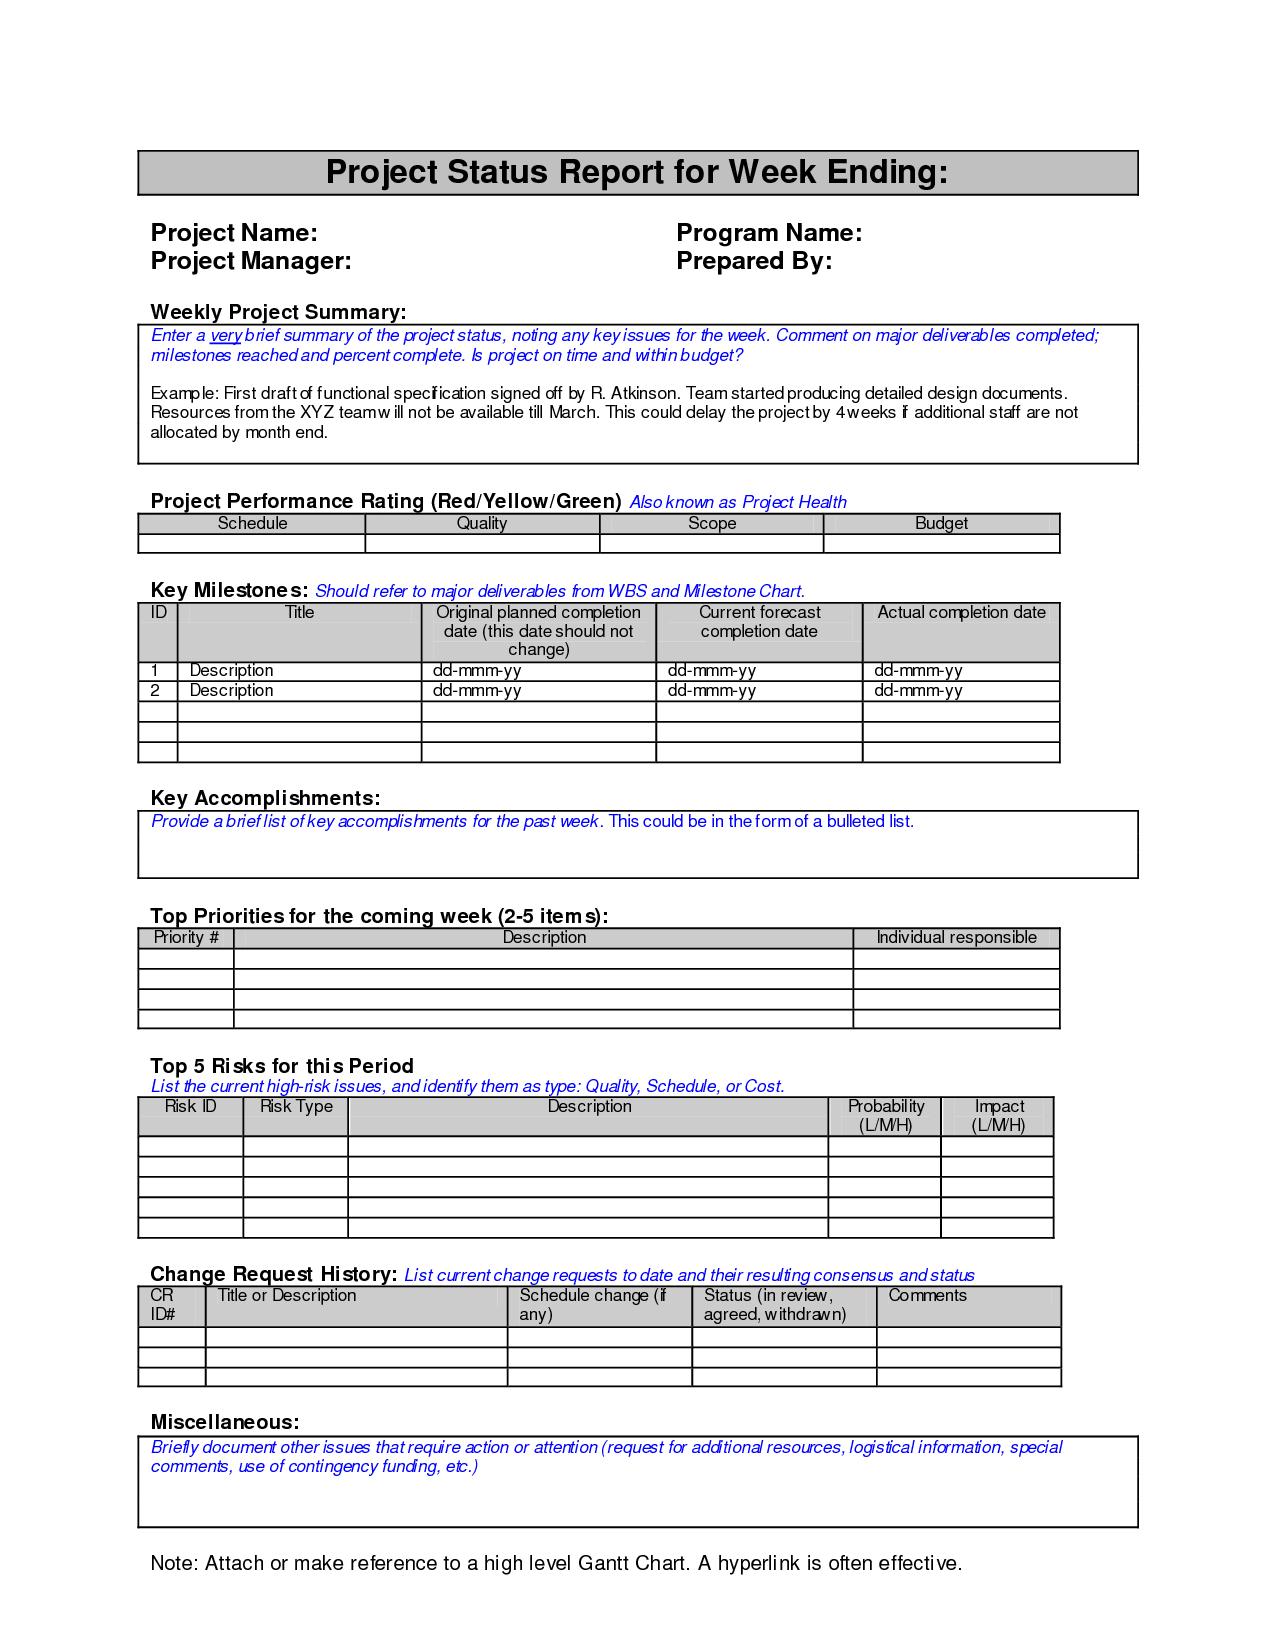 Project Status Template | Project Status Report Sample Km Pinterest Project Status